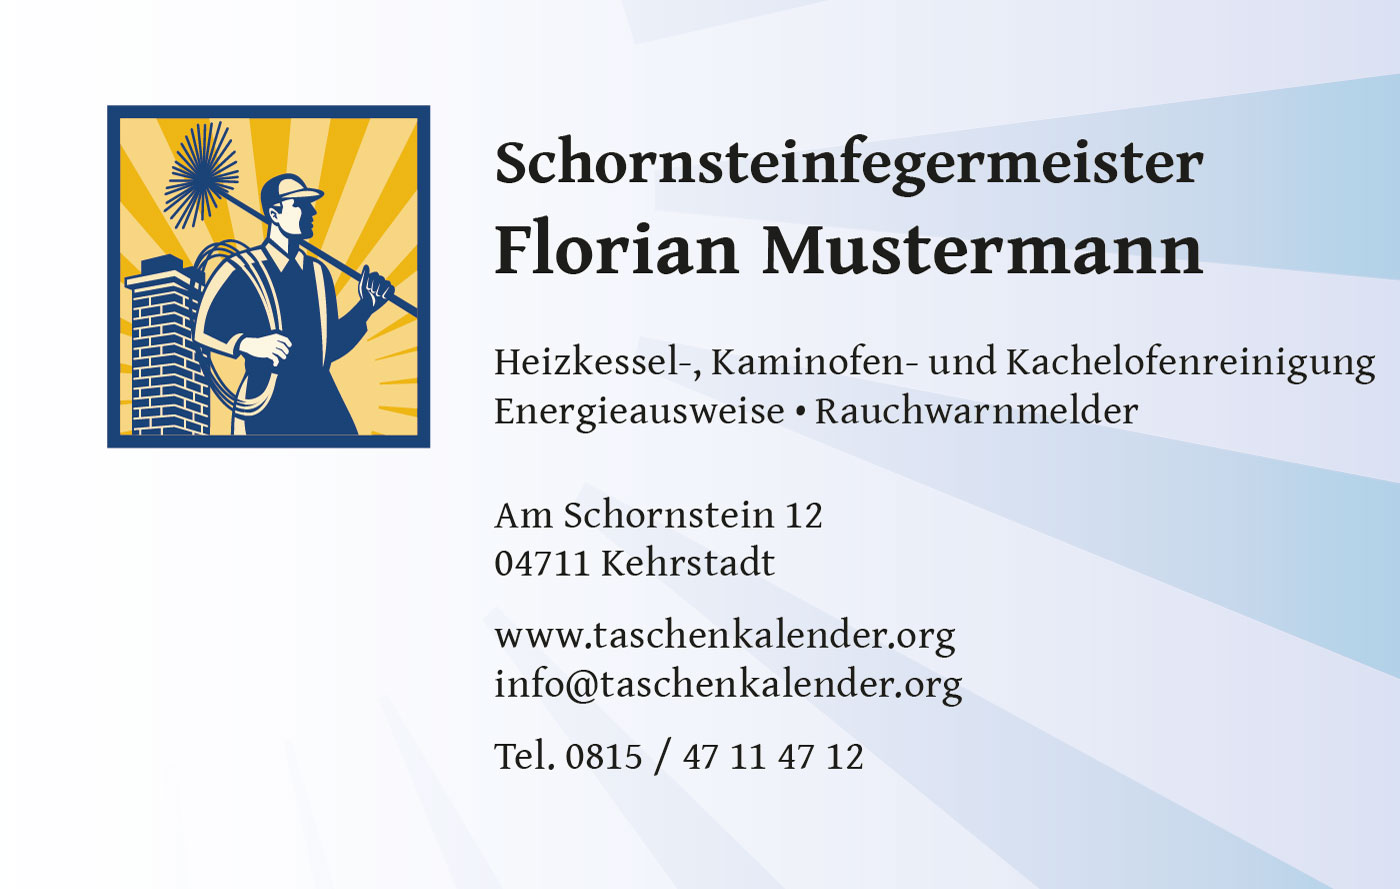 schornsteinfegerdesign04